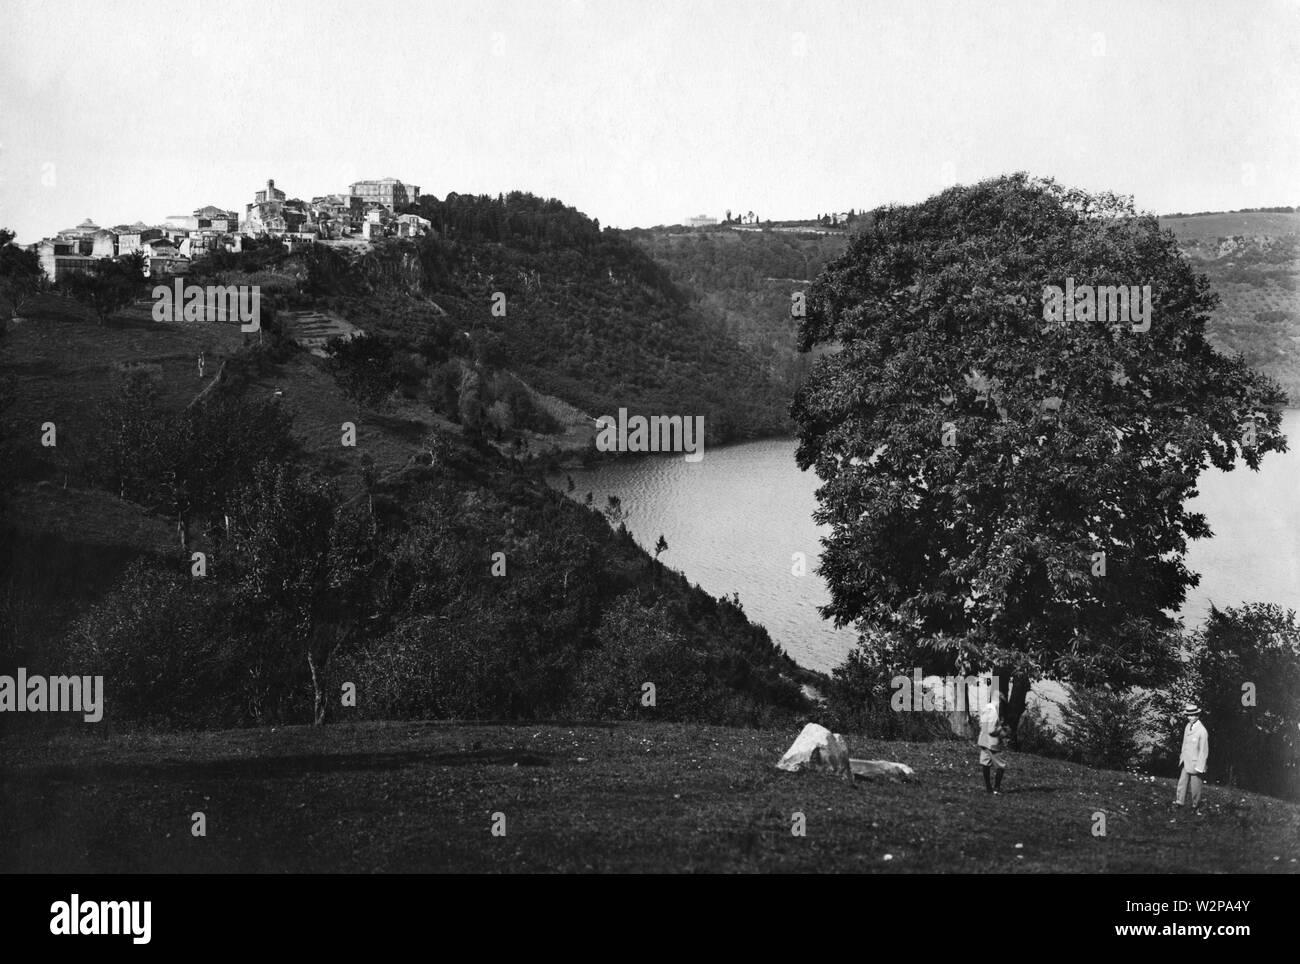 lazio, lake of nemi and view of genzano, 1910-20 - Stock Image